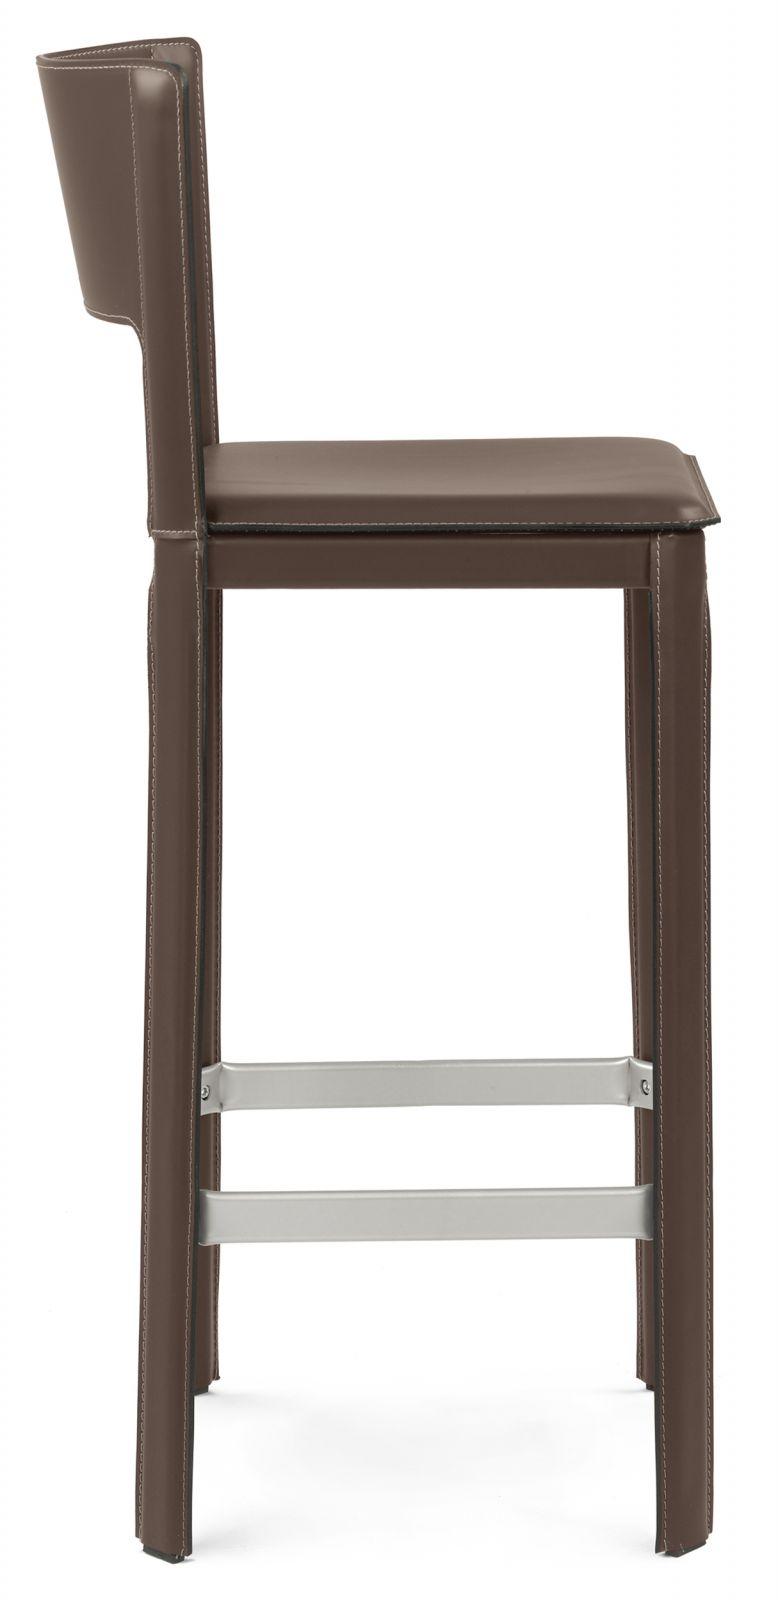 modern-bar-stools-Italian-furniture-large (29).jpg